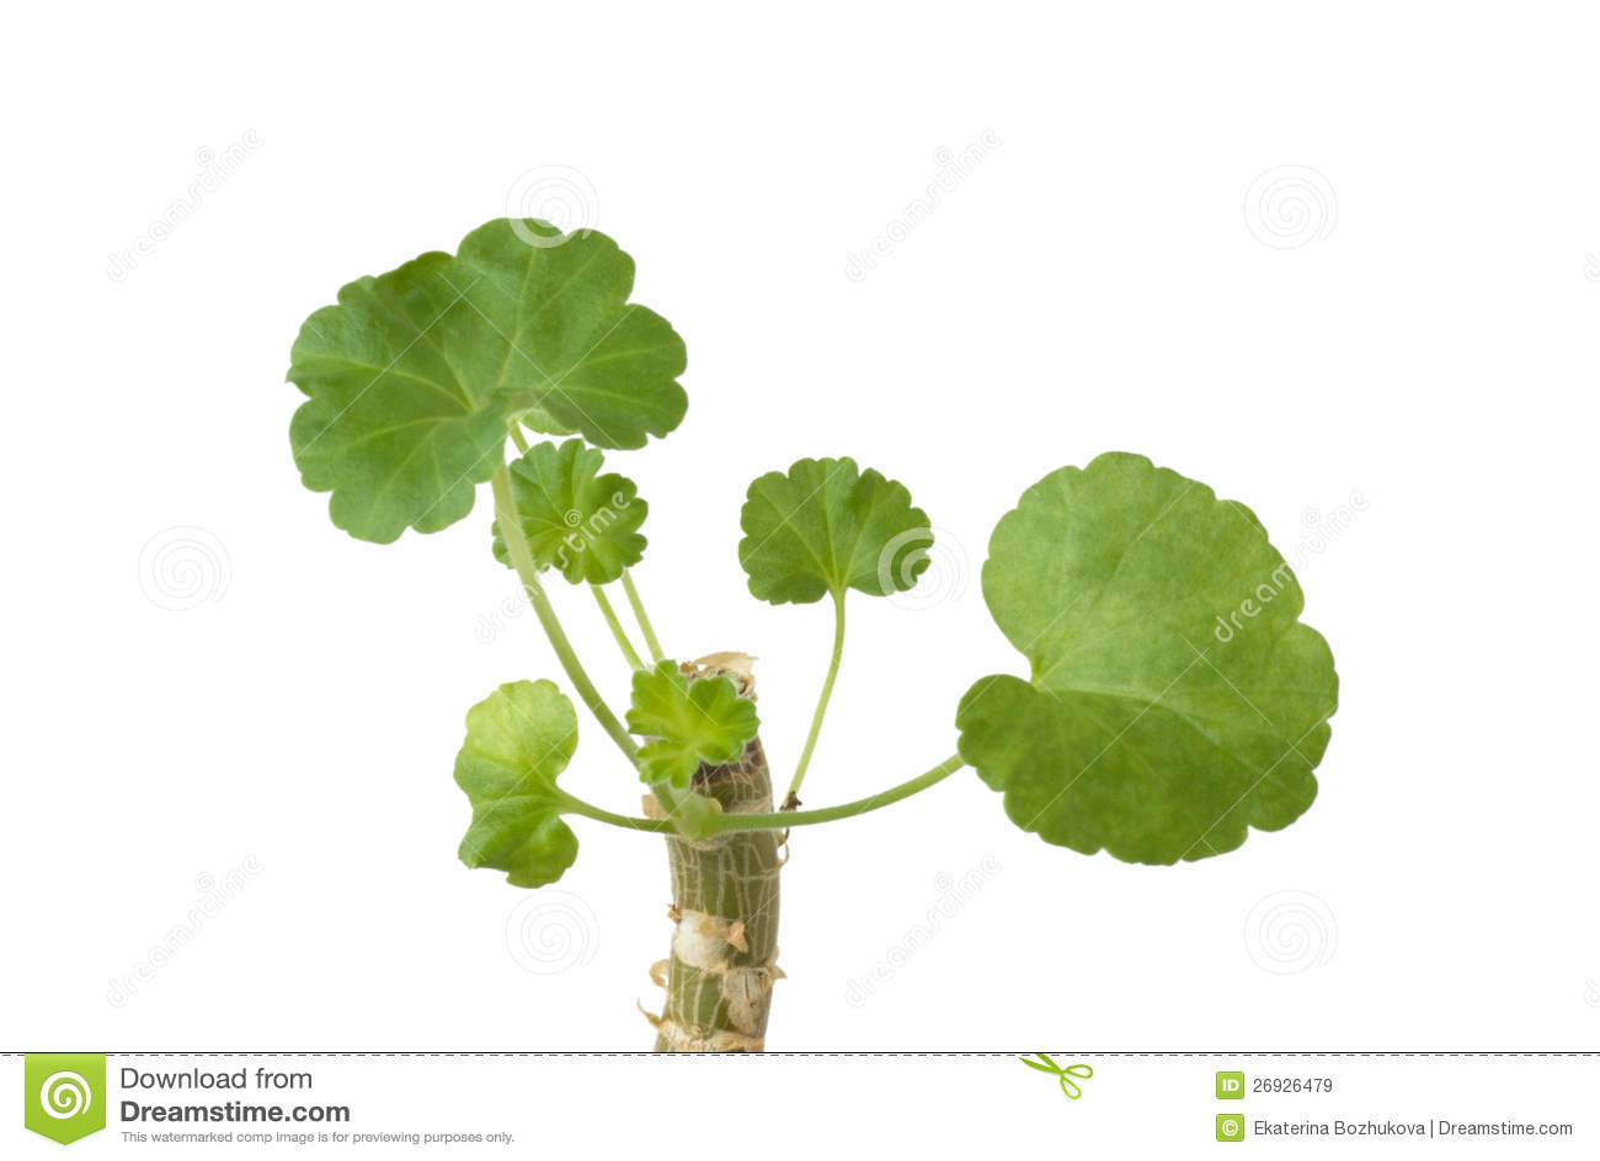 Geranium Plant Stem With Leaves Stock Image - Image: 26926479